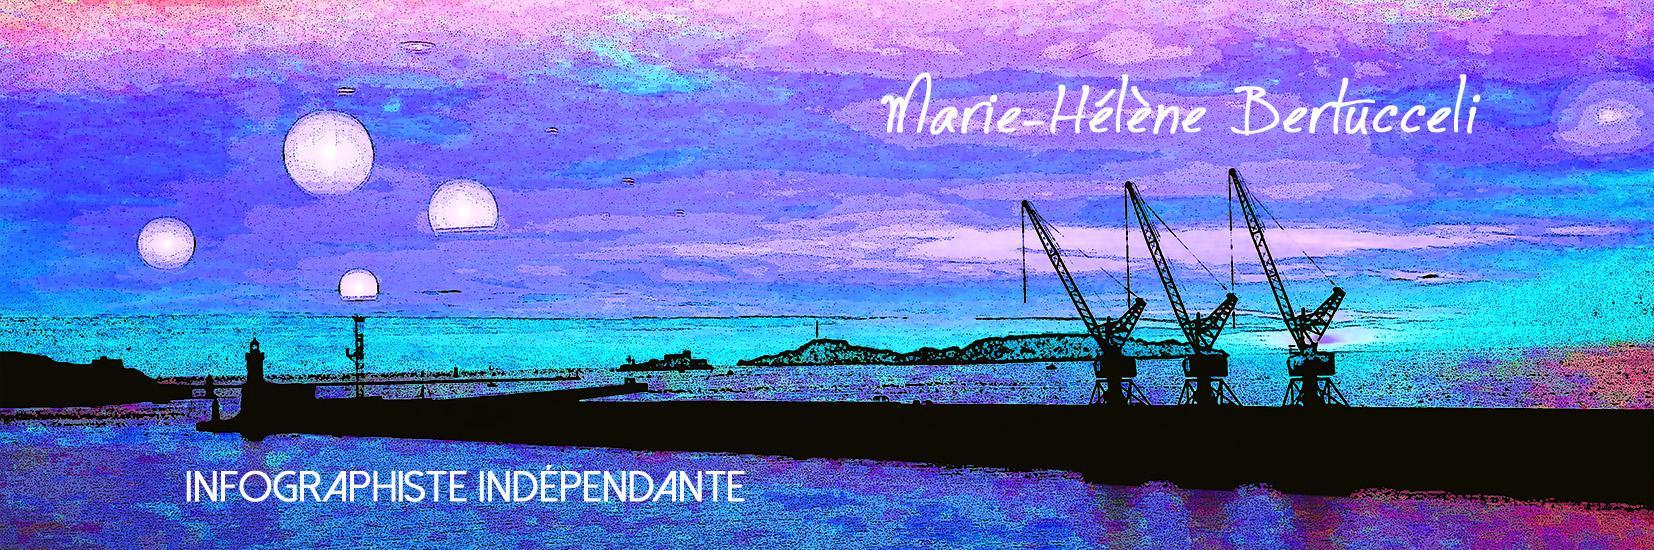 Graphiste freelance à Marseille - Mh Bertucceli